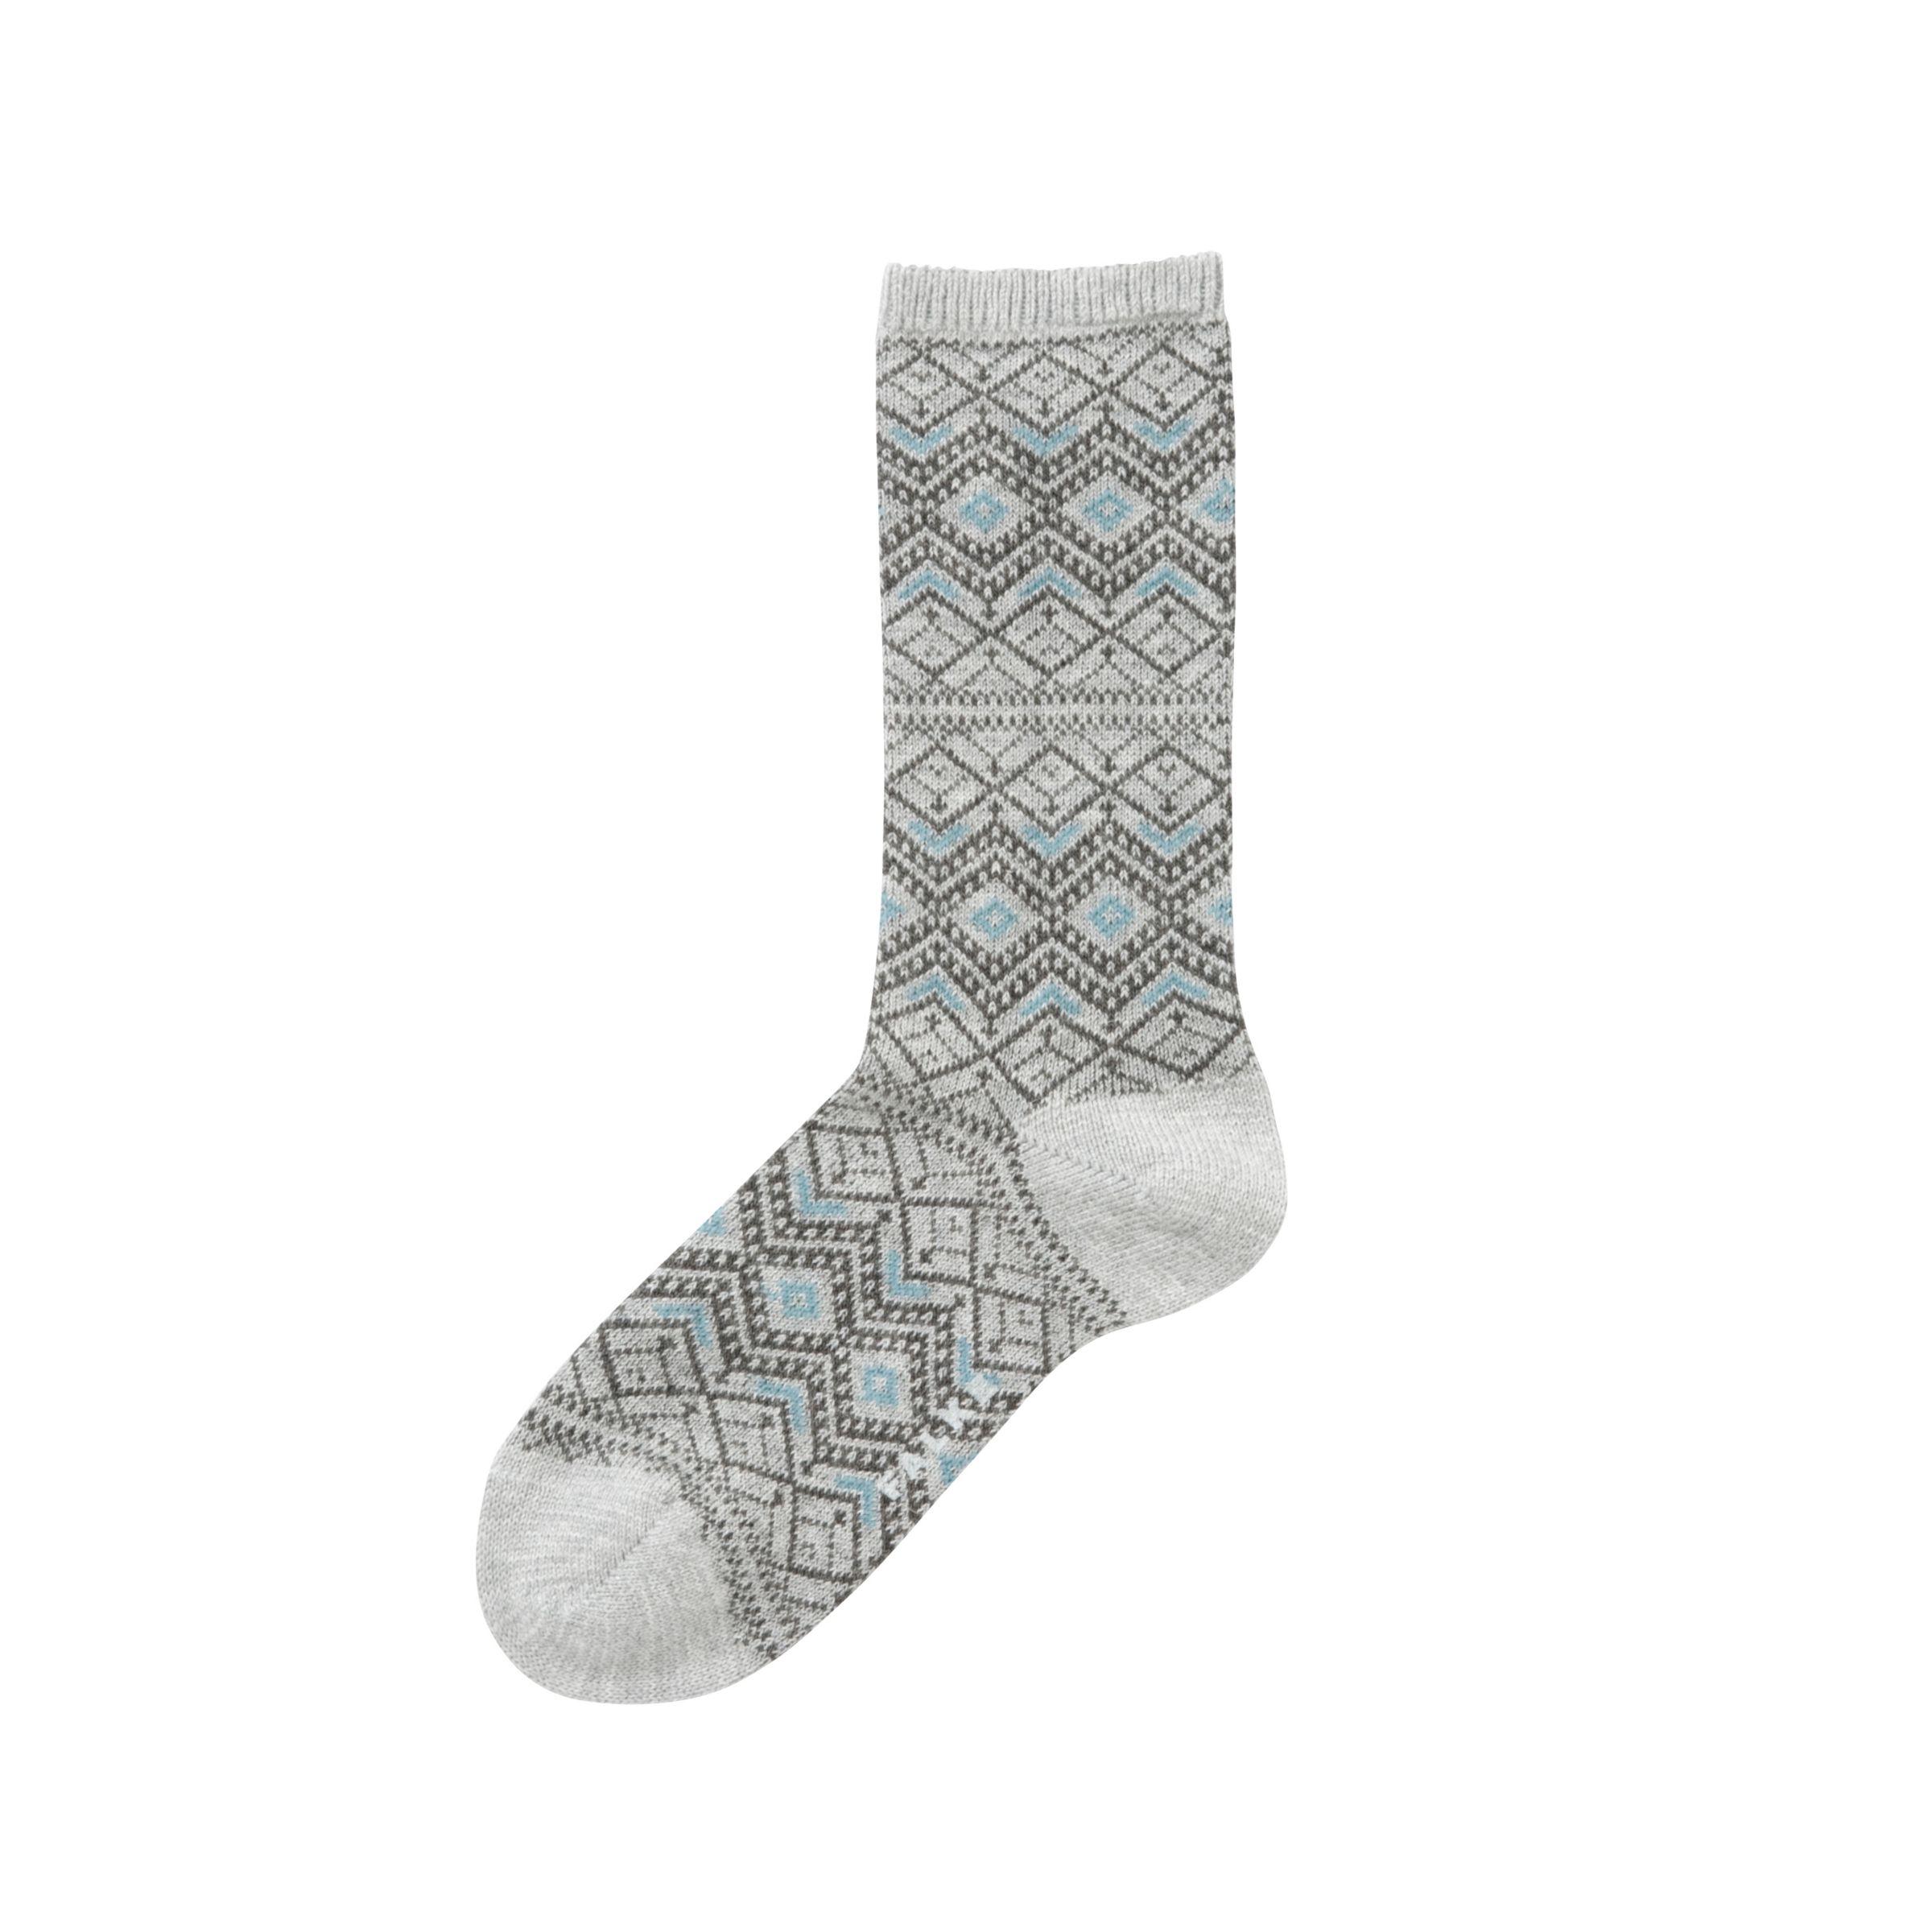 Falke Fair Isle Ankle Socks, Grey